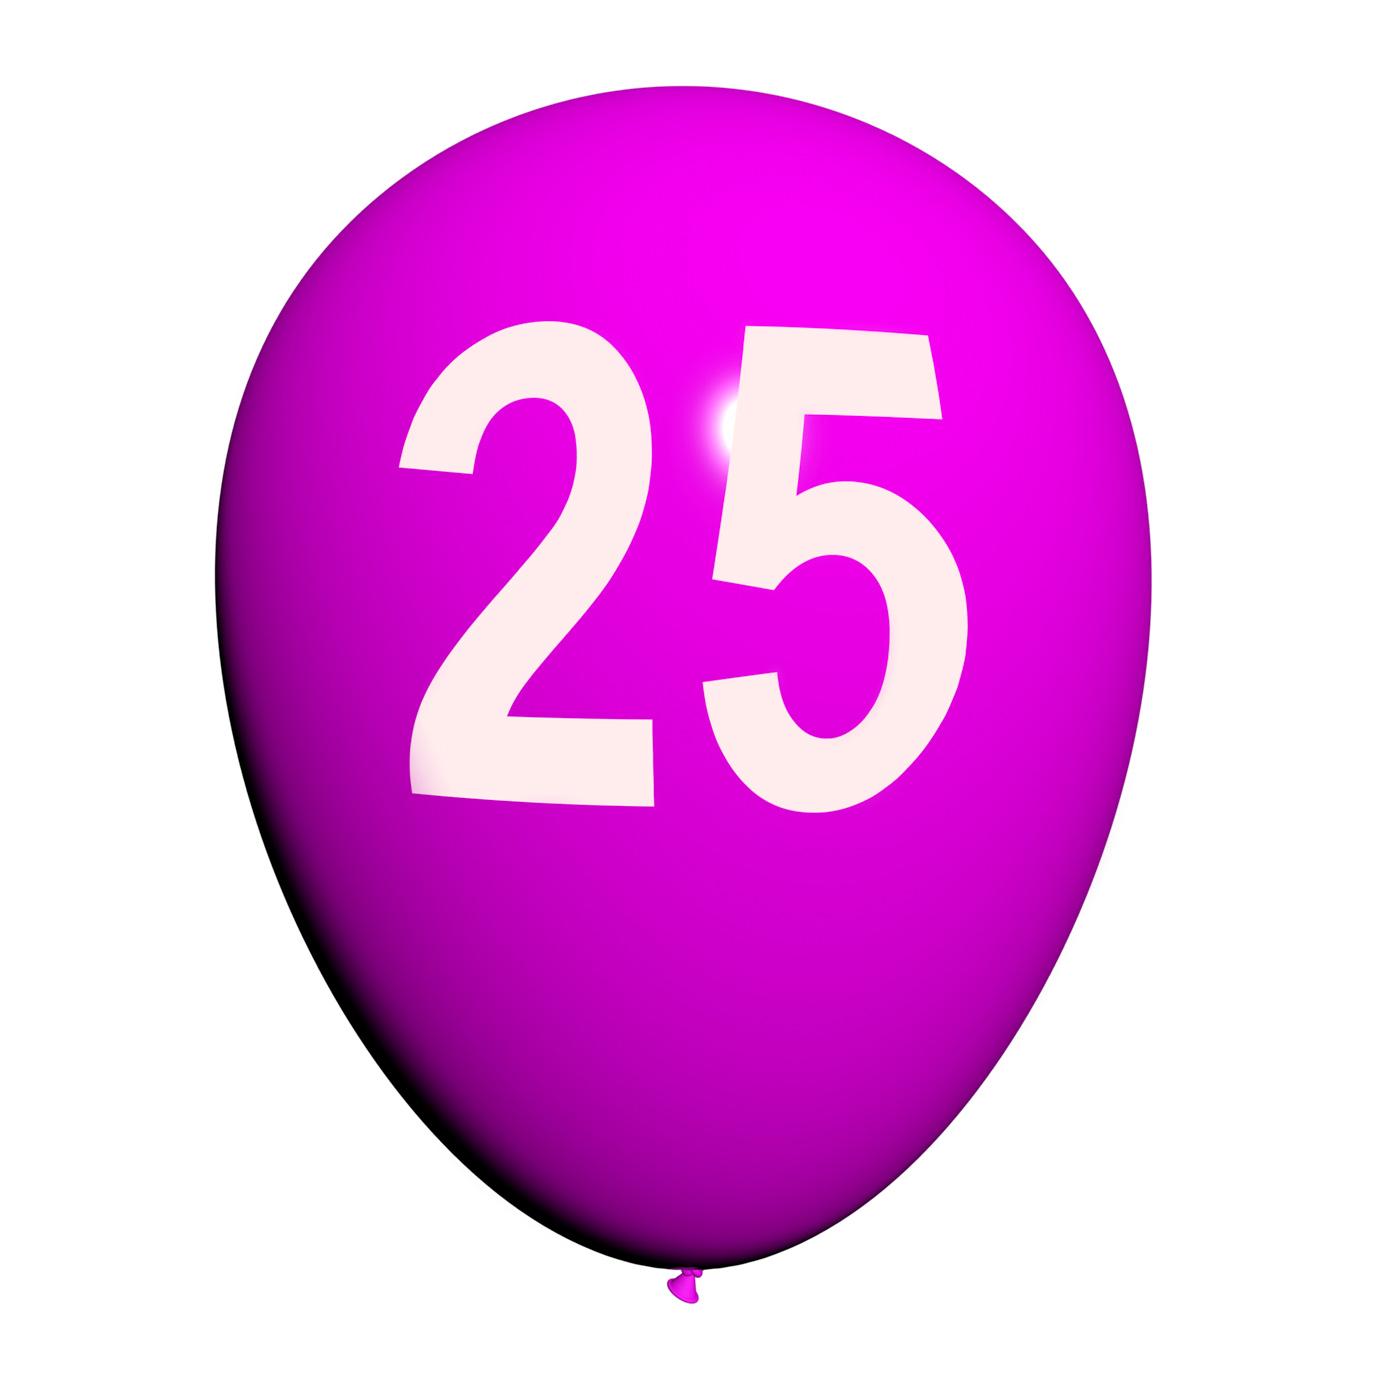 25 Balloon Shows Twenty-fifth Happy Birthday Celebration, 25, 25th, Adult, Adulthood, HQ Photo